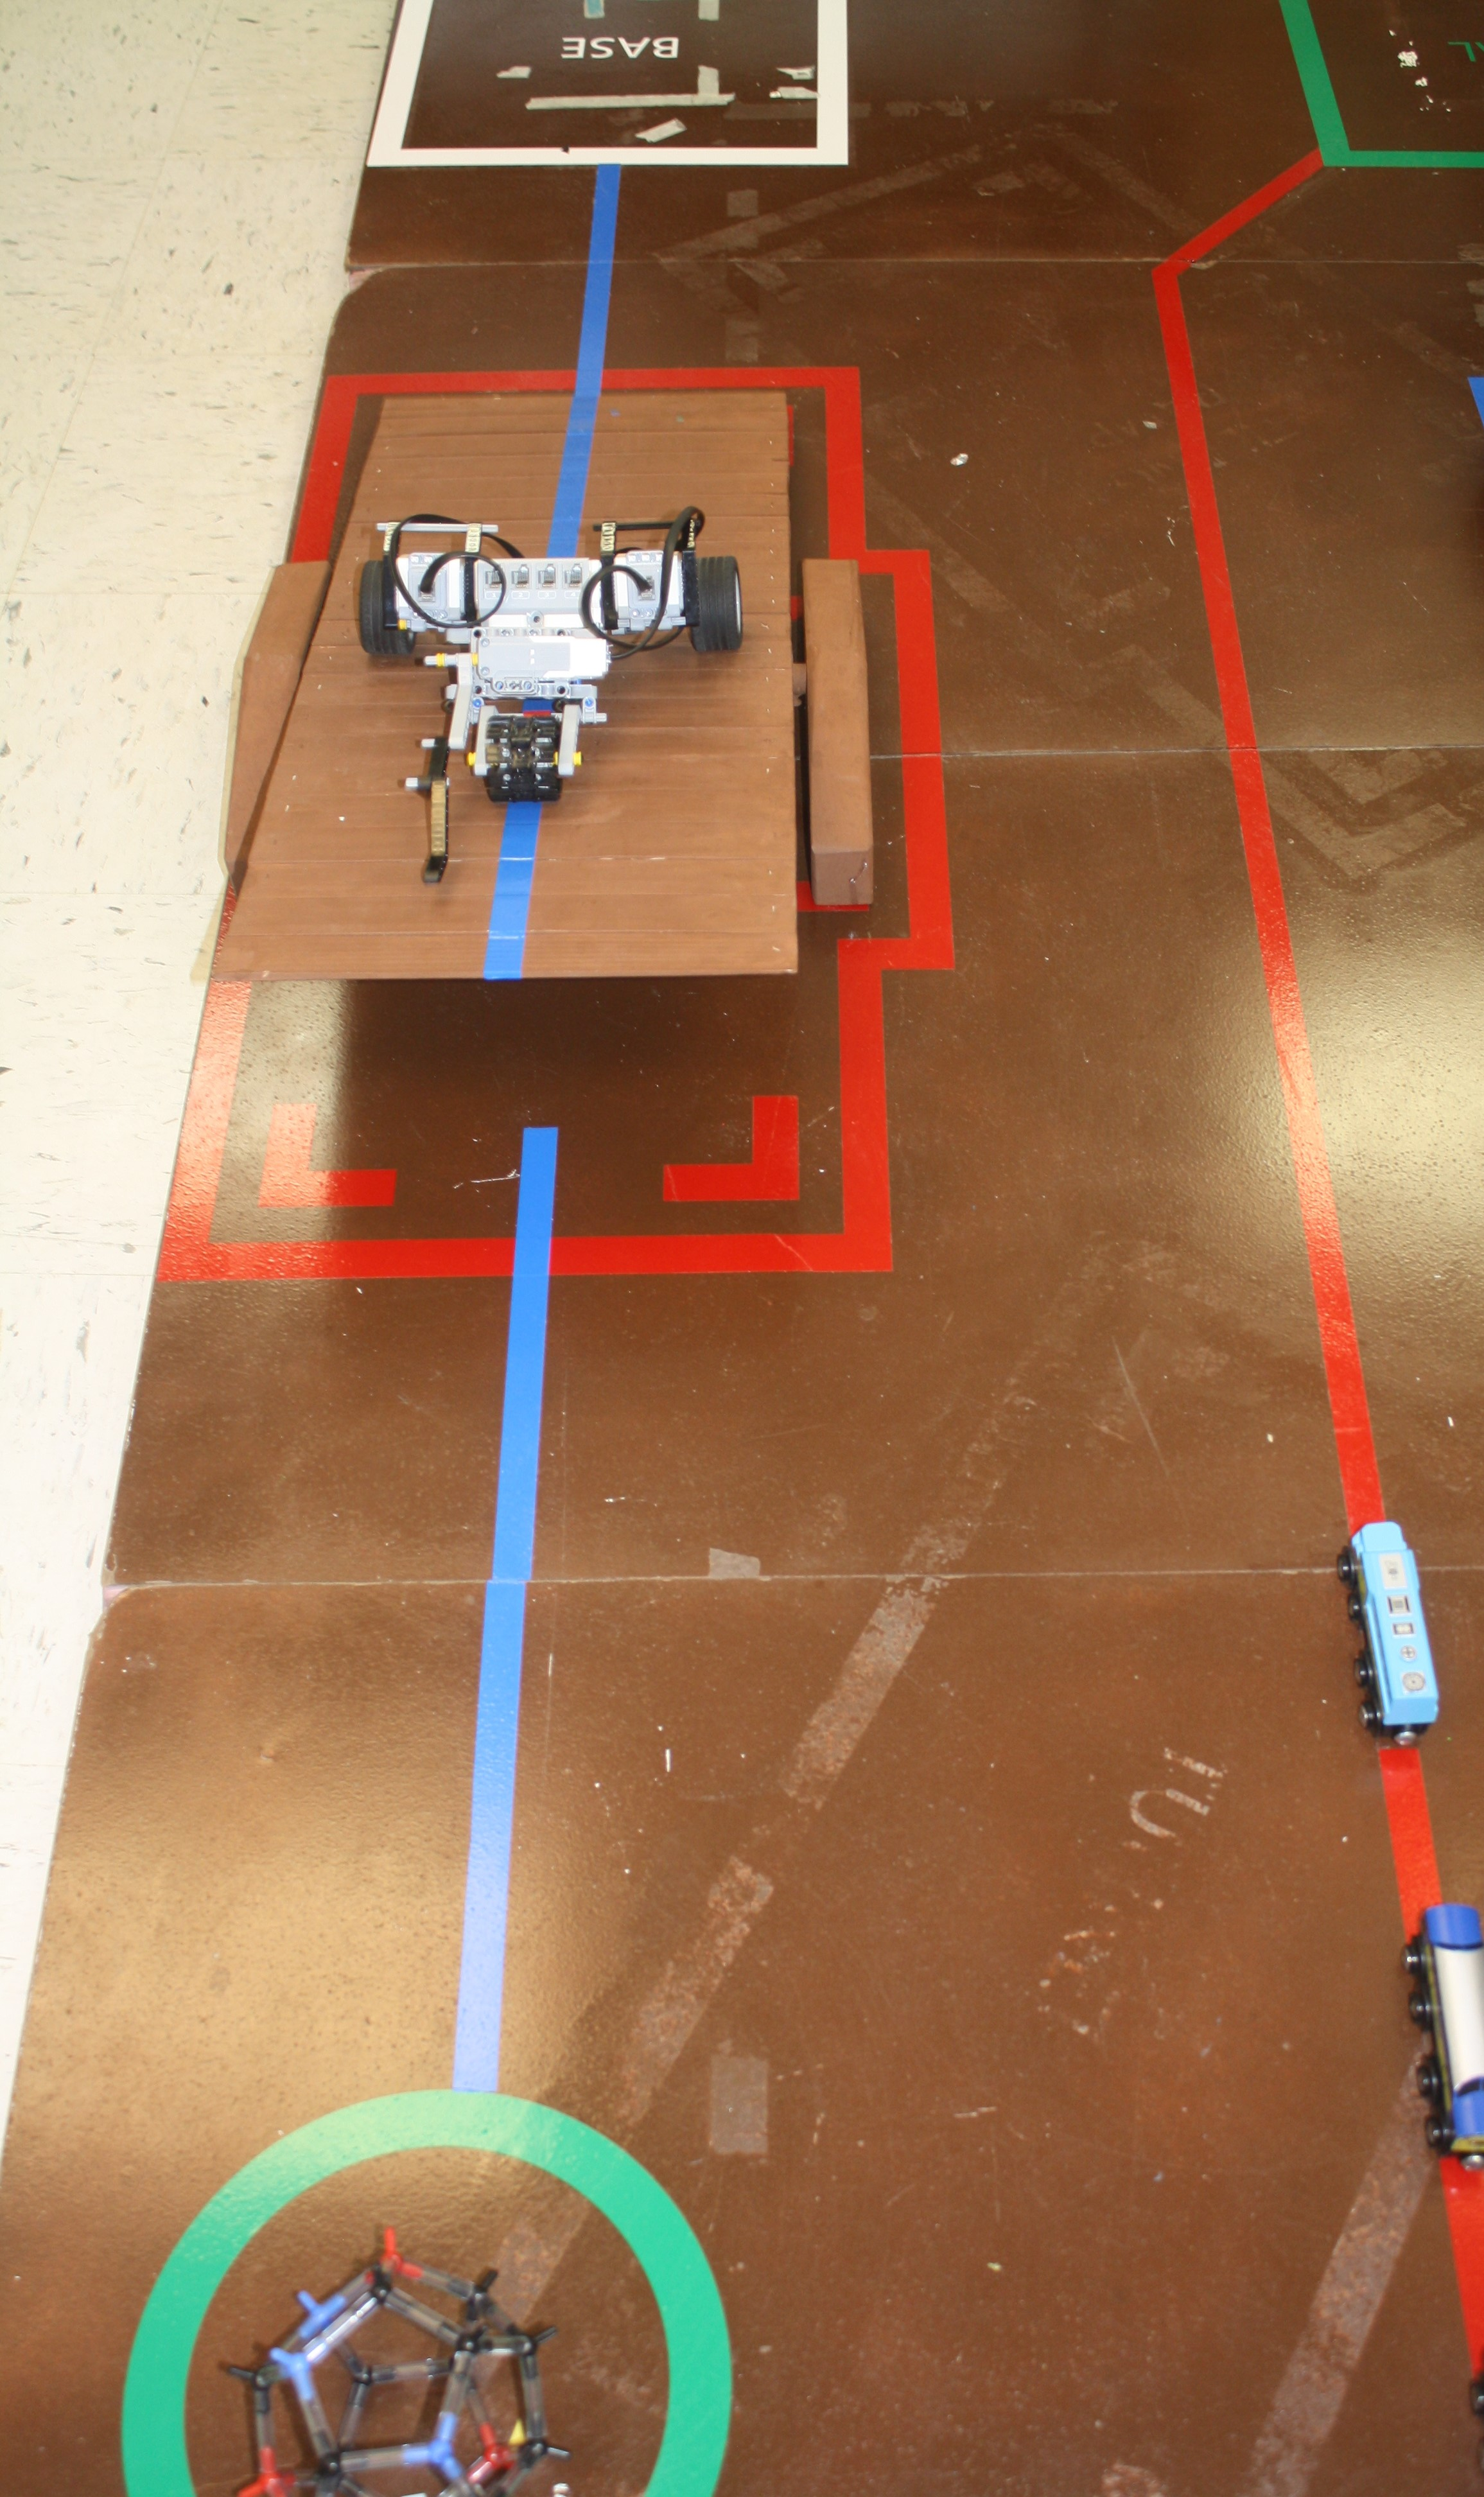 A photo of the robotics activity.